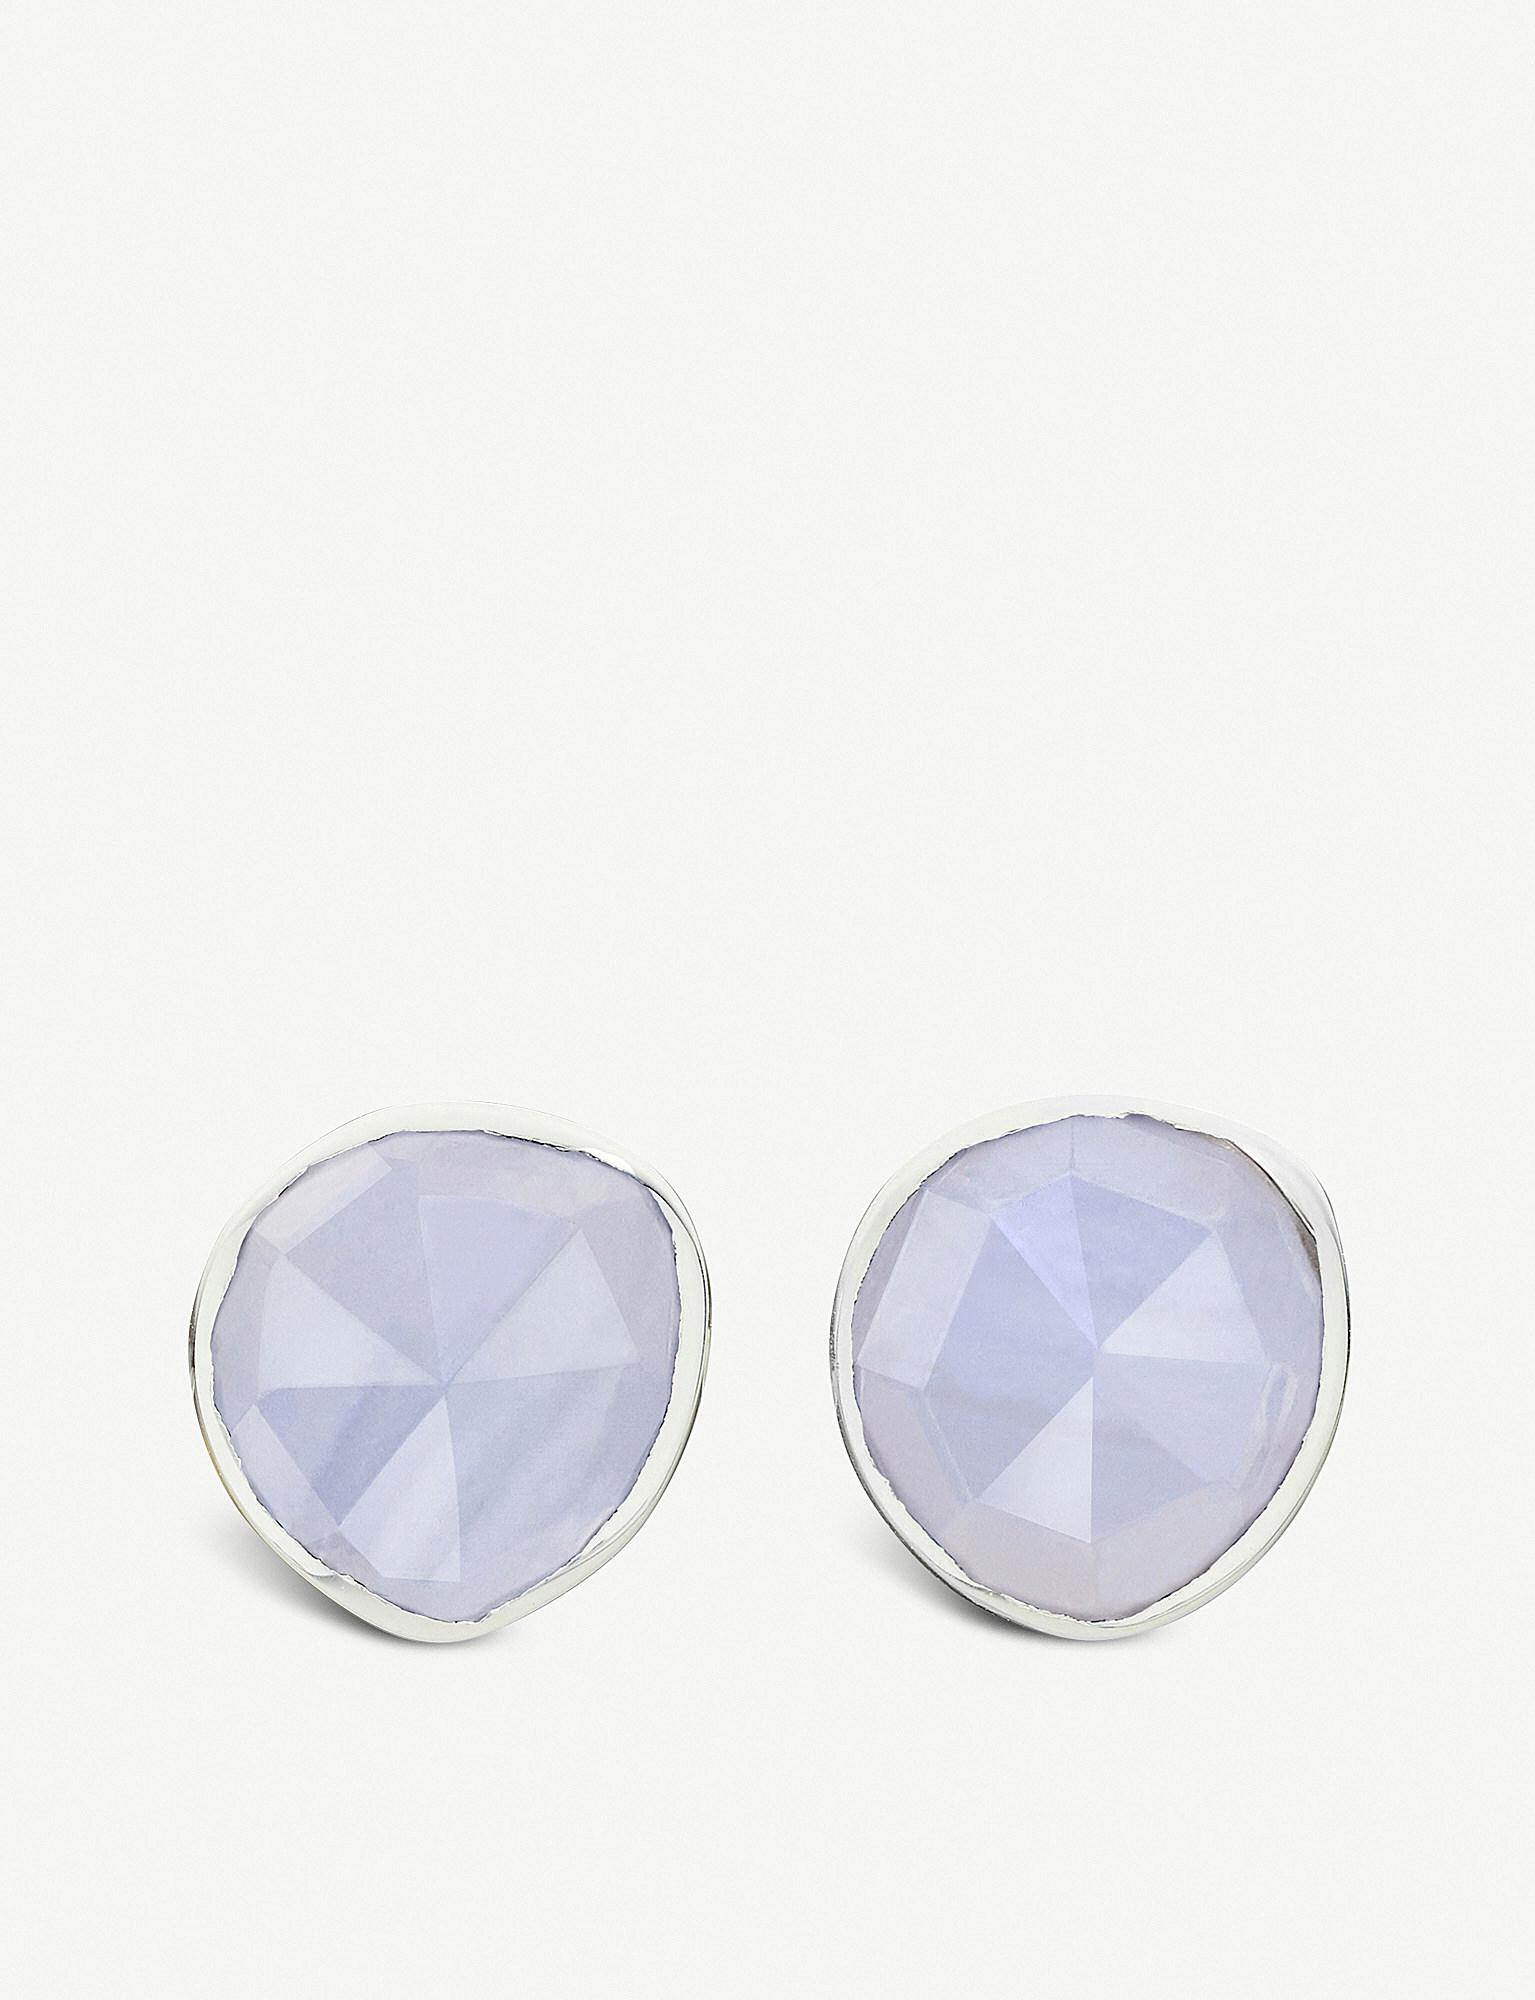 Sterling Silver Siren Stud Earrings Blue Lace Agate Monica Vinader tXgG9RC